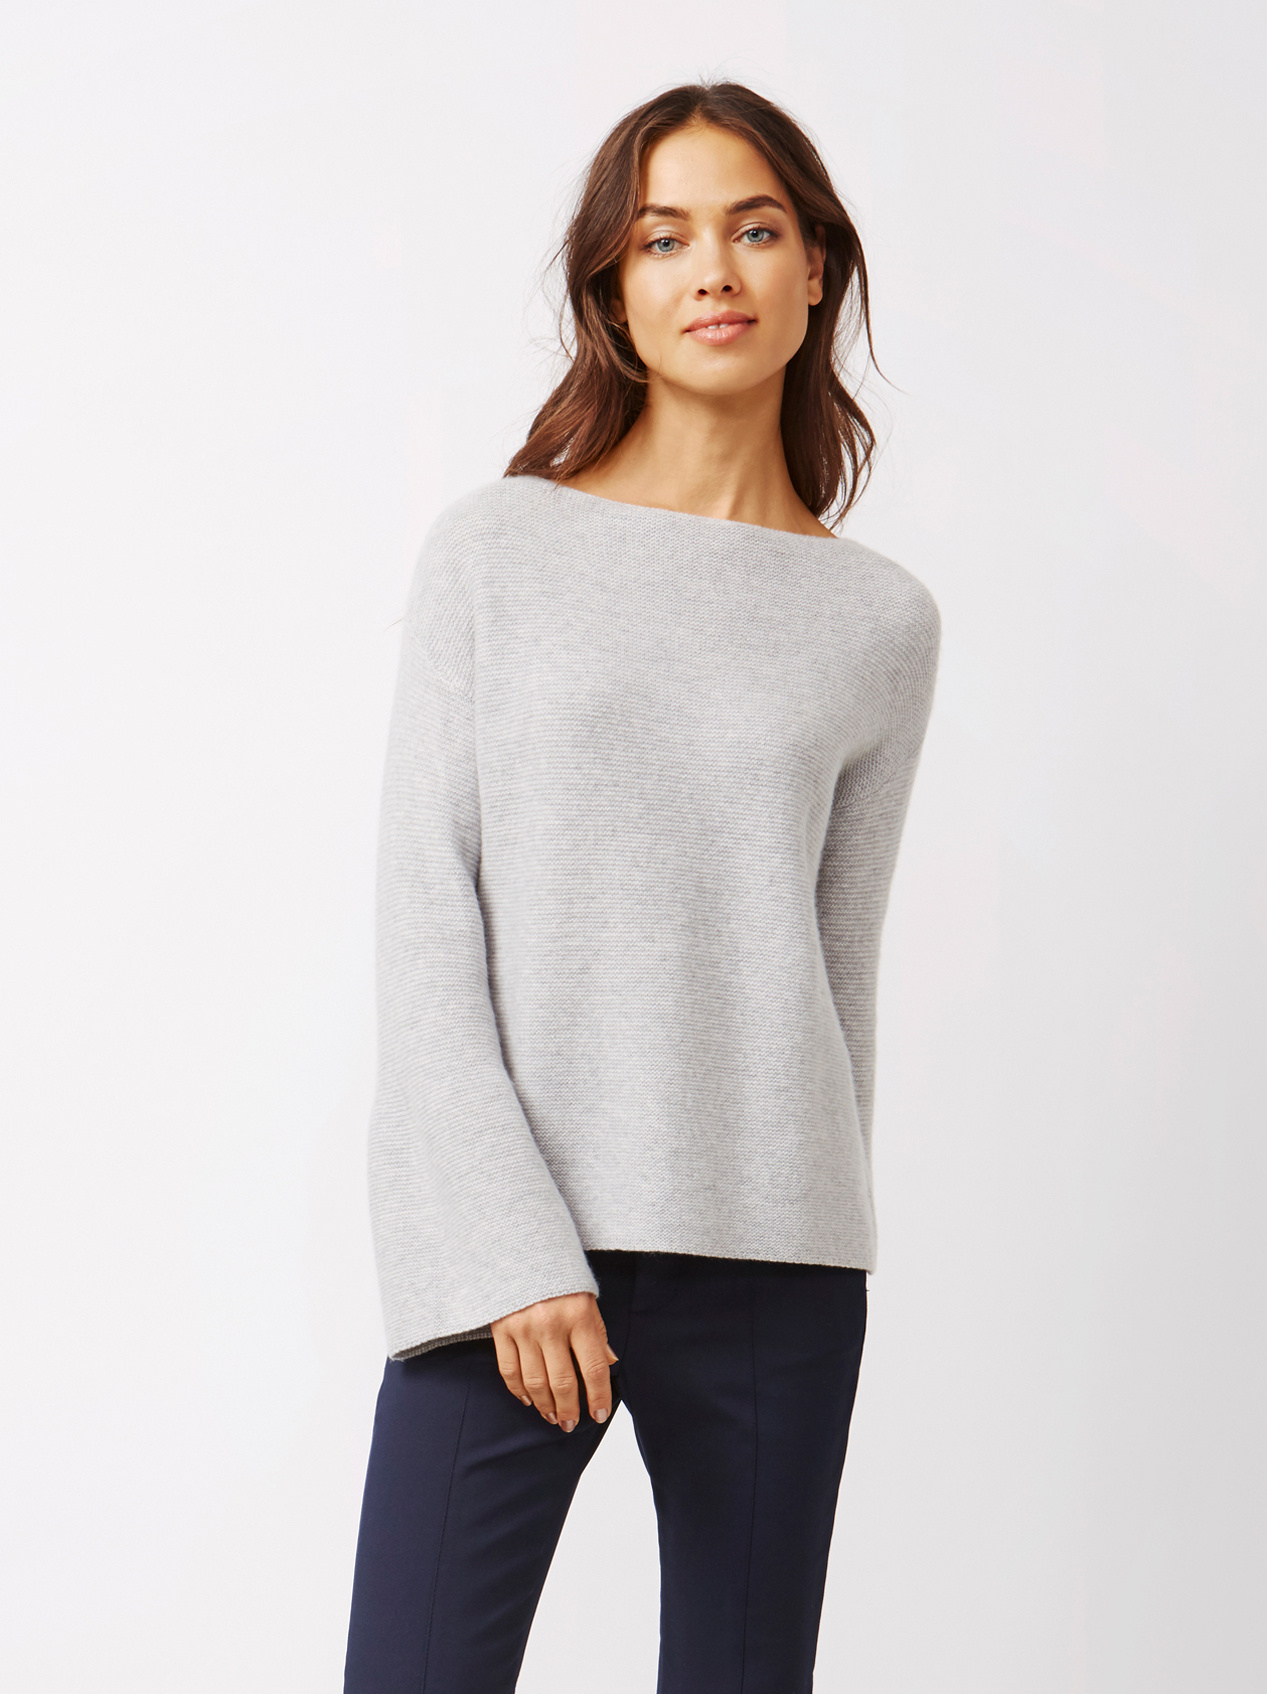 Soft Goat Women's Chunky Boatneck Light Grey